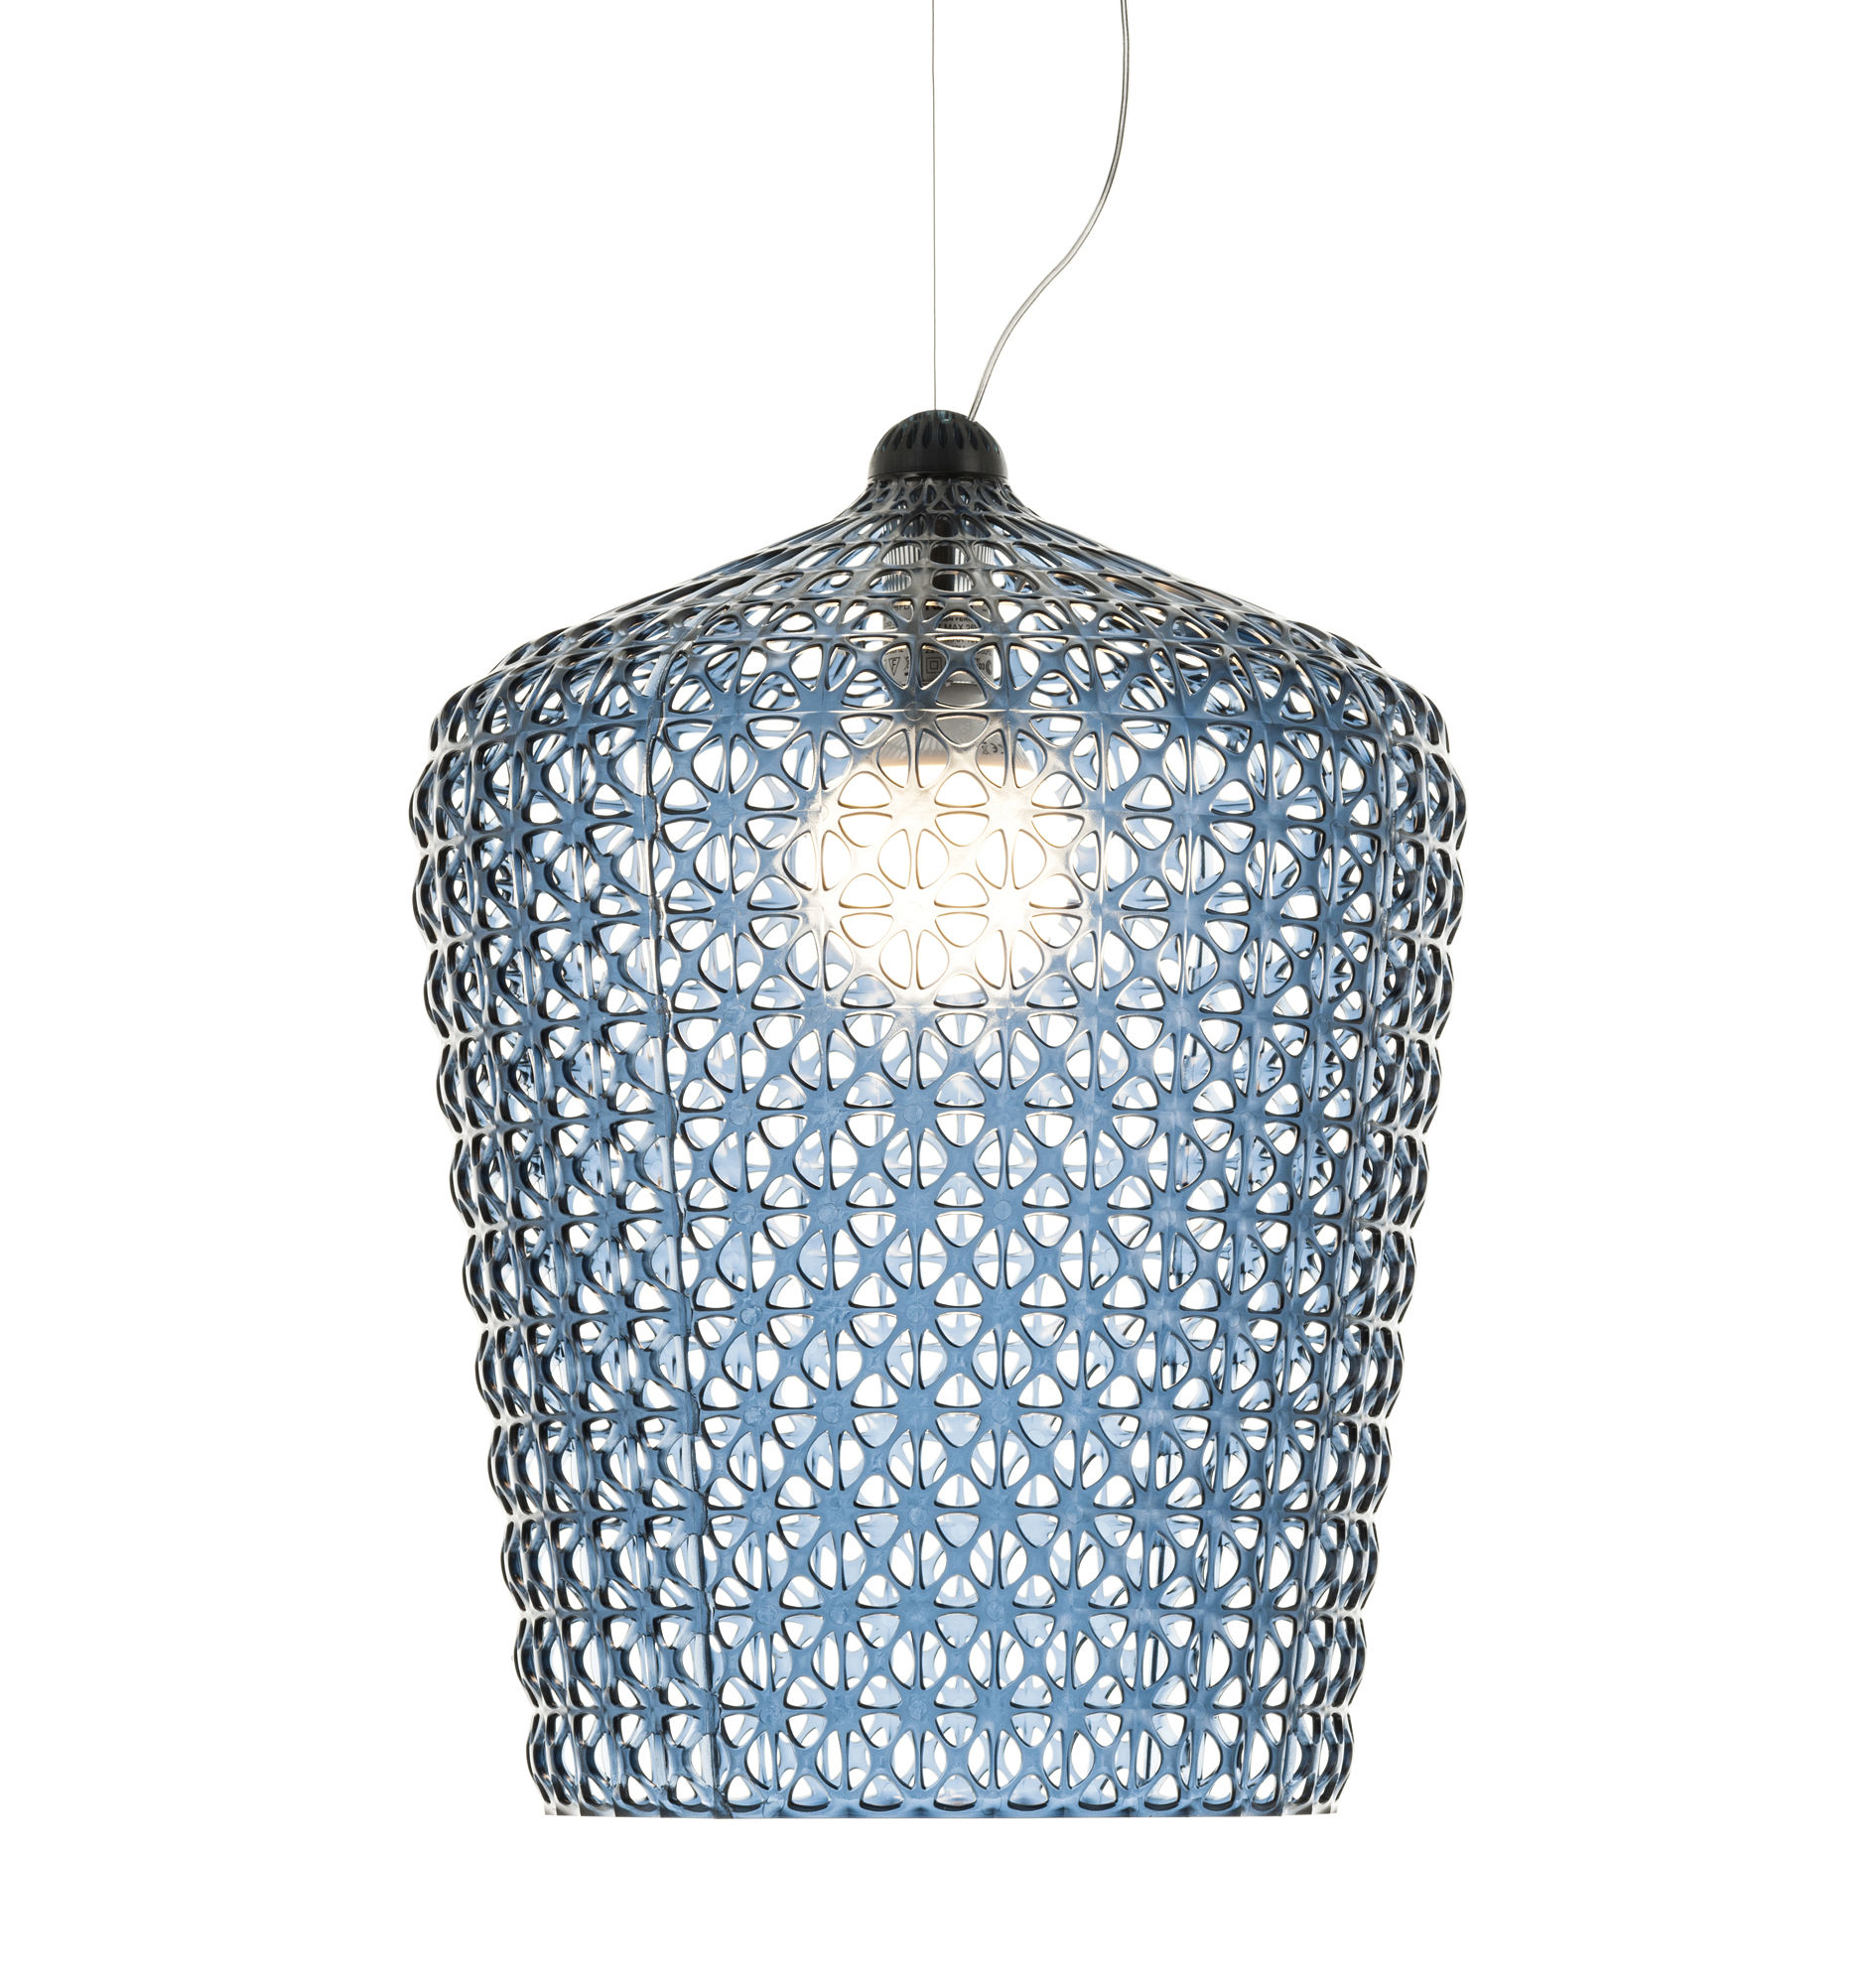 Illuminazione - Lampadari - Sospensione Kabuki - / Ø 50 x H 63 cm - Plastica traforata di Kartell - Blu trasparente - Technopolymère thermoplastique